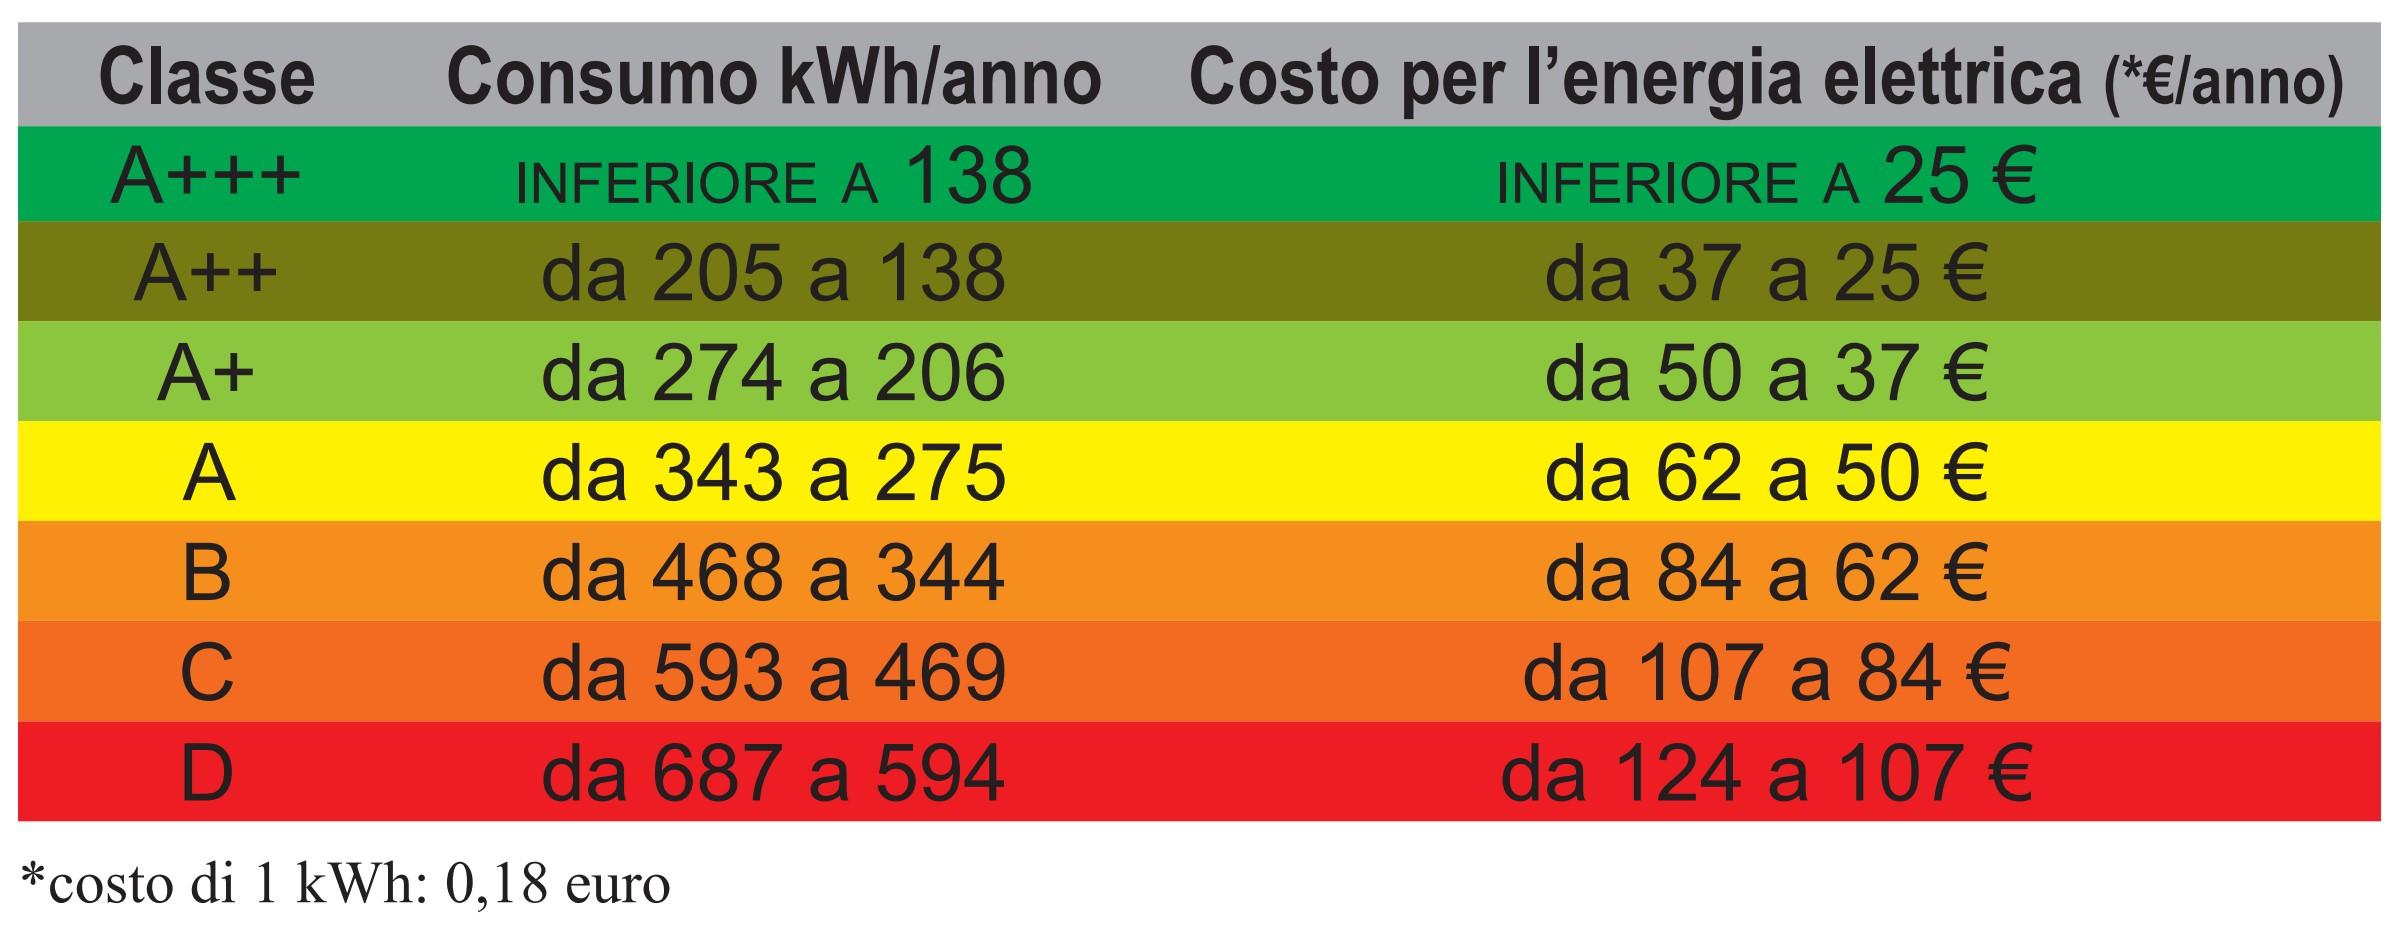 Qual è il consumo di ogni classe energetica?